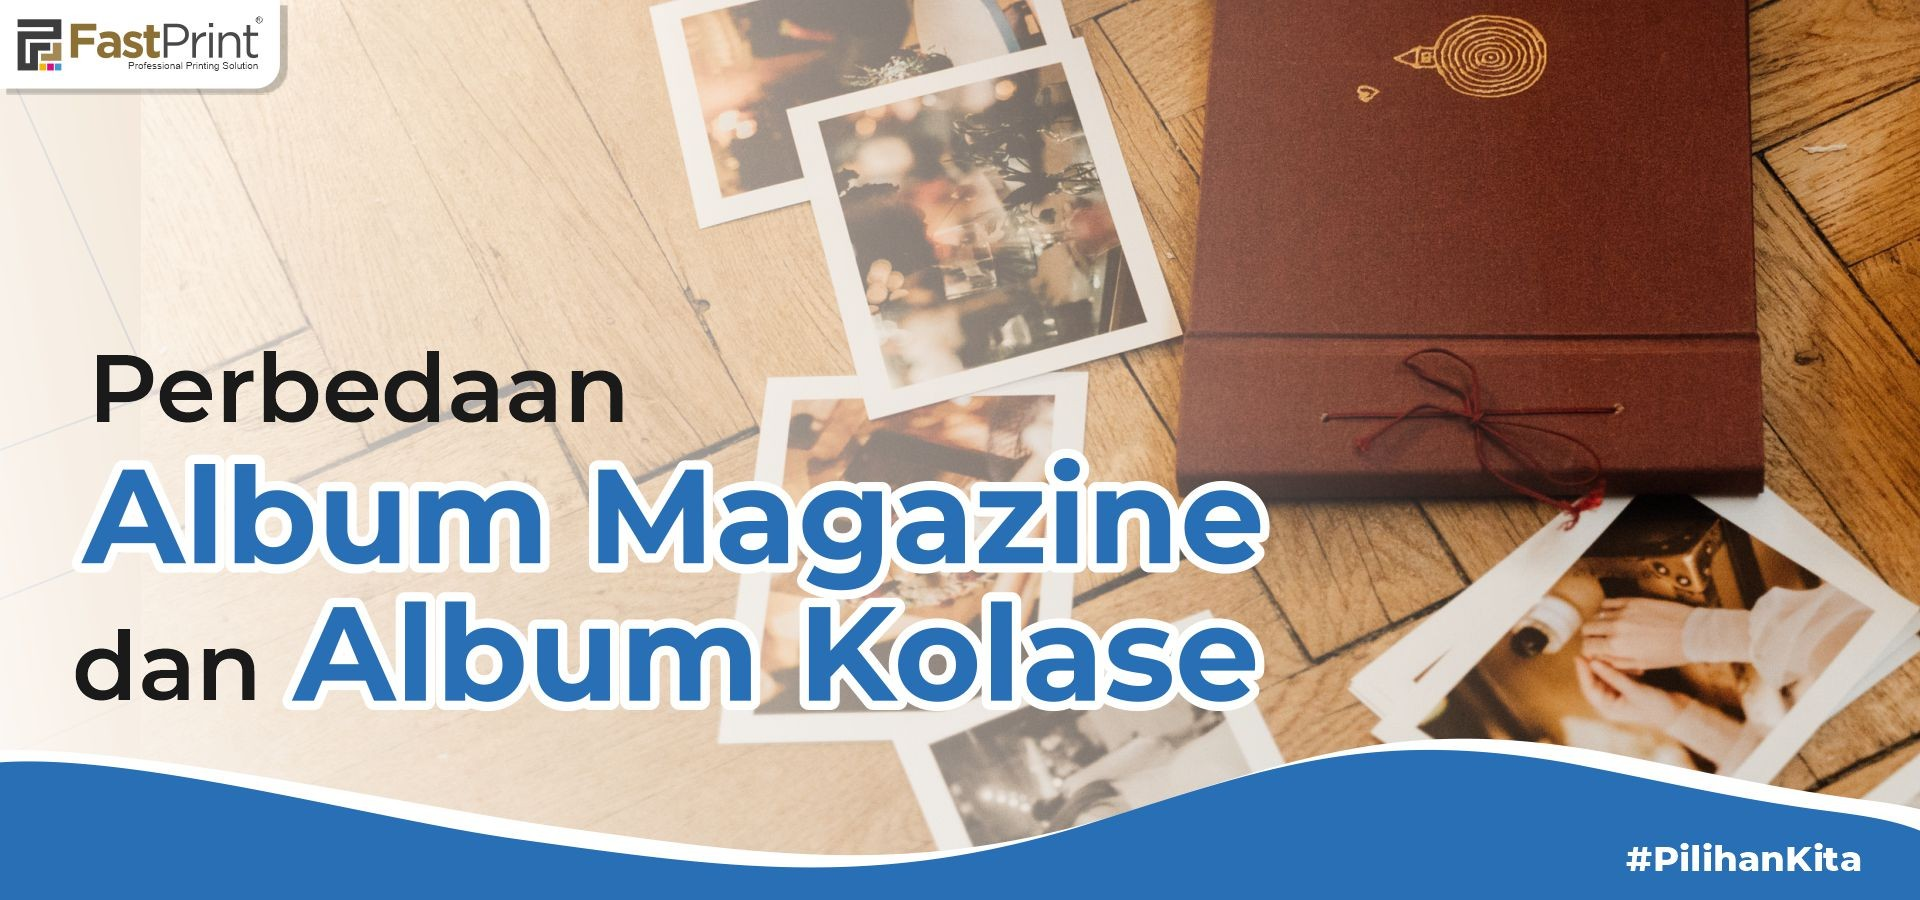 album magazine, album kolase, perbedaan album magazine dan album kolase